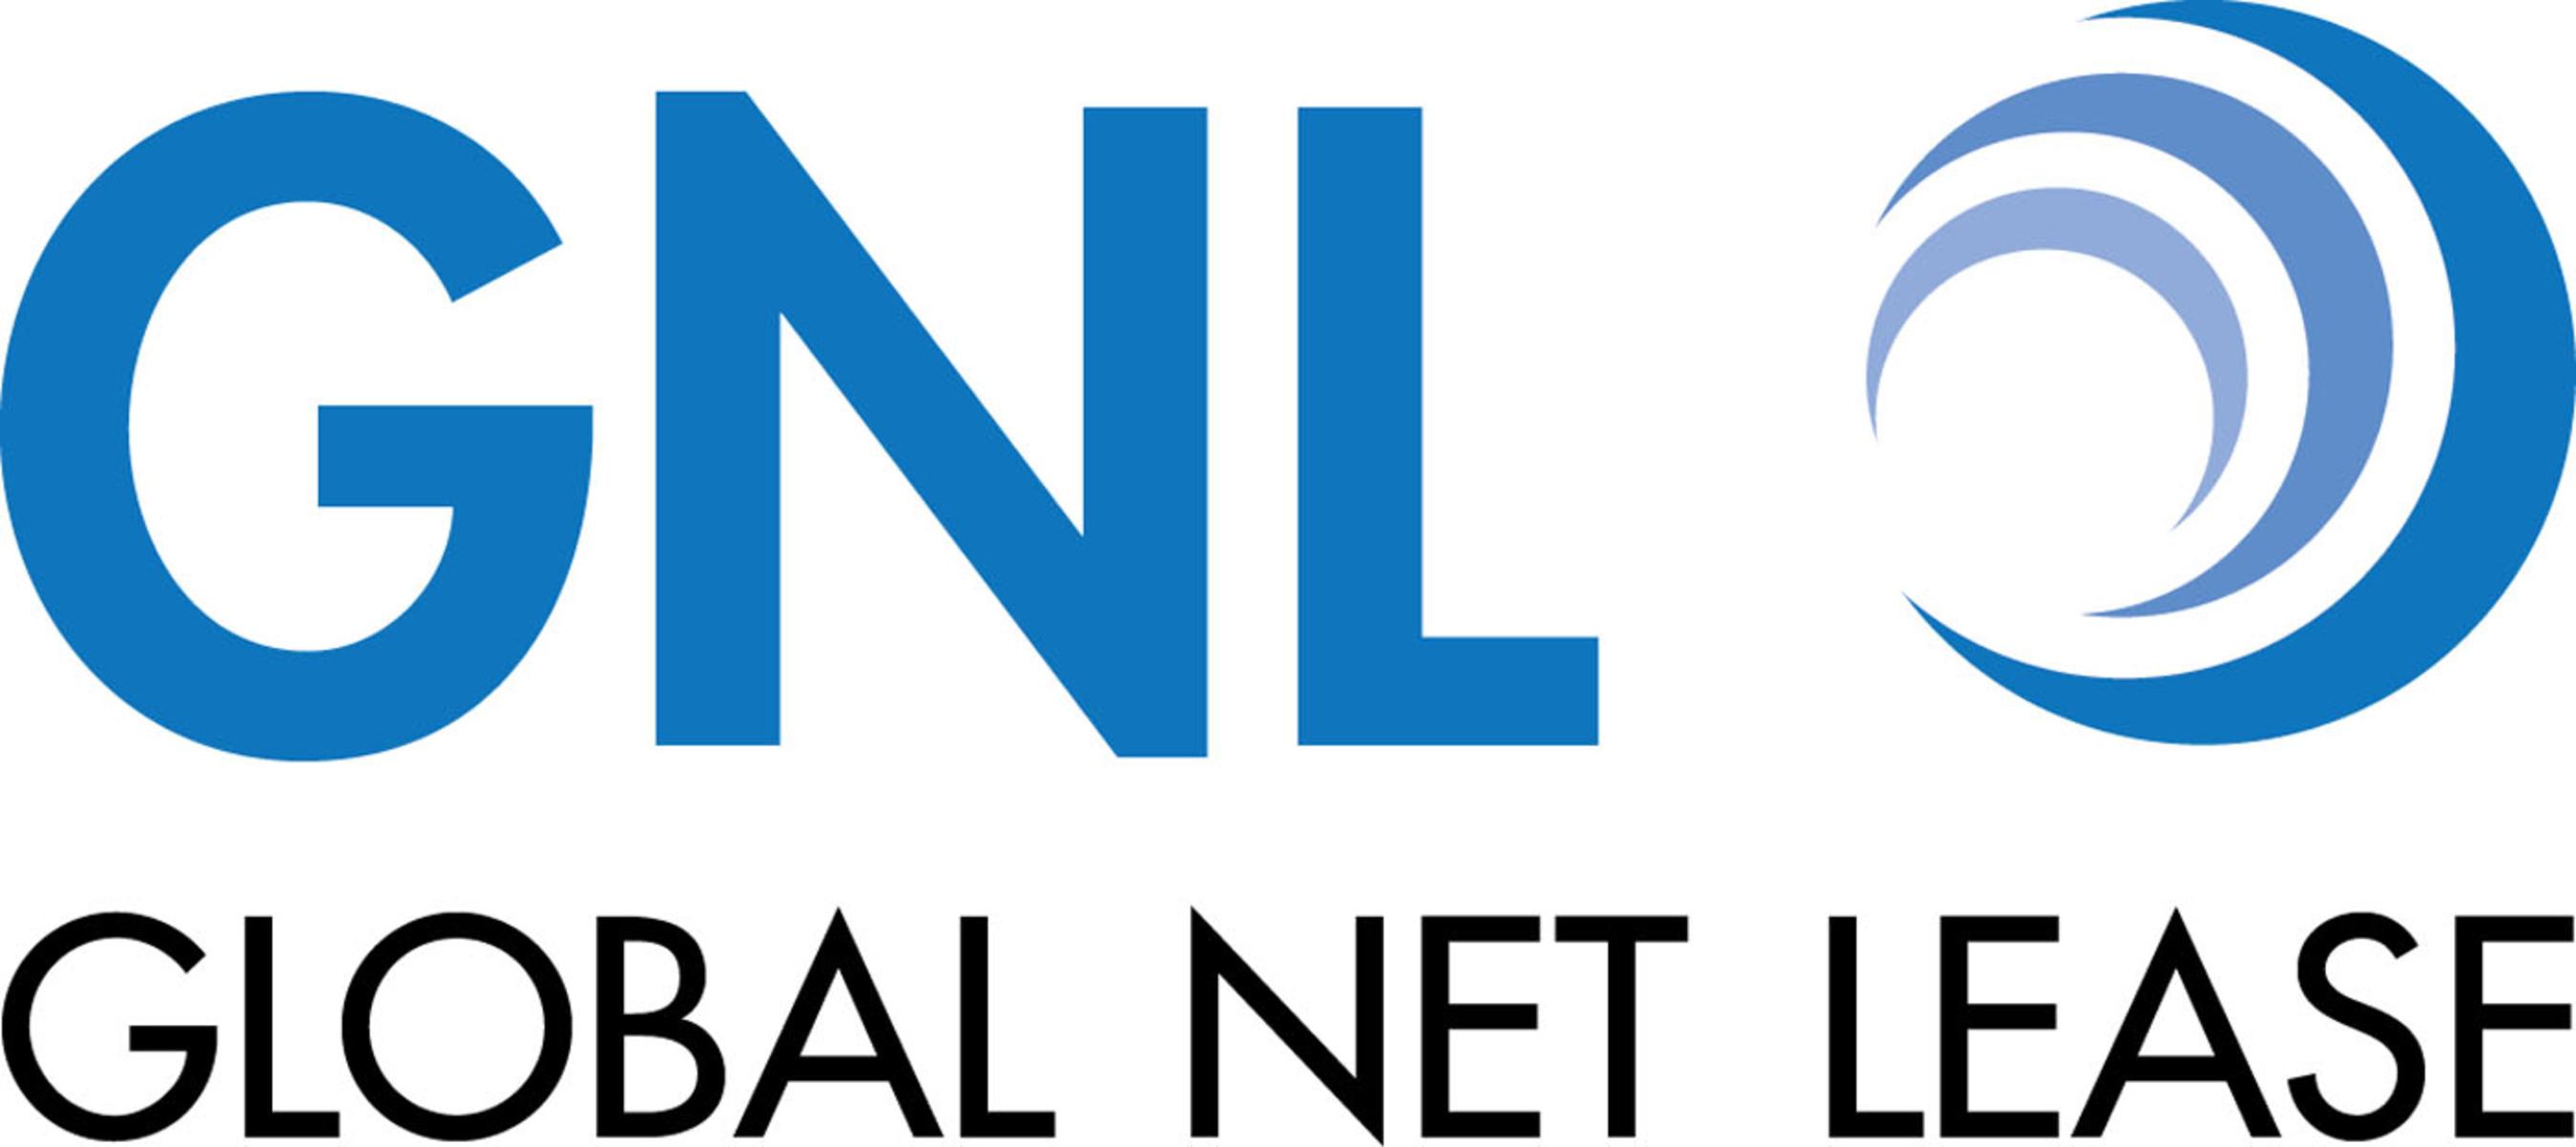 Global Net Lease.